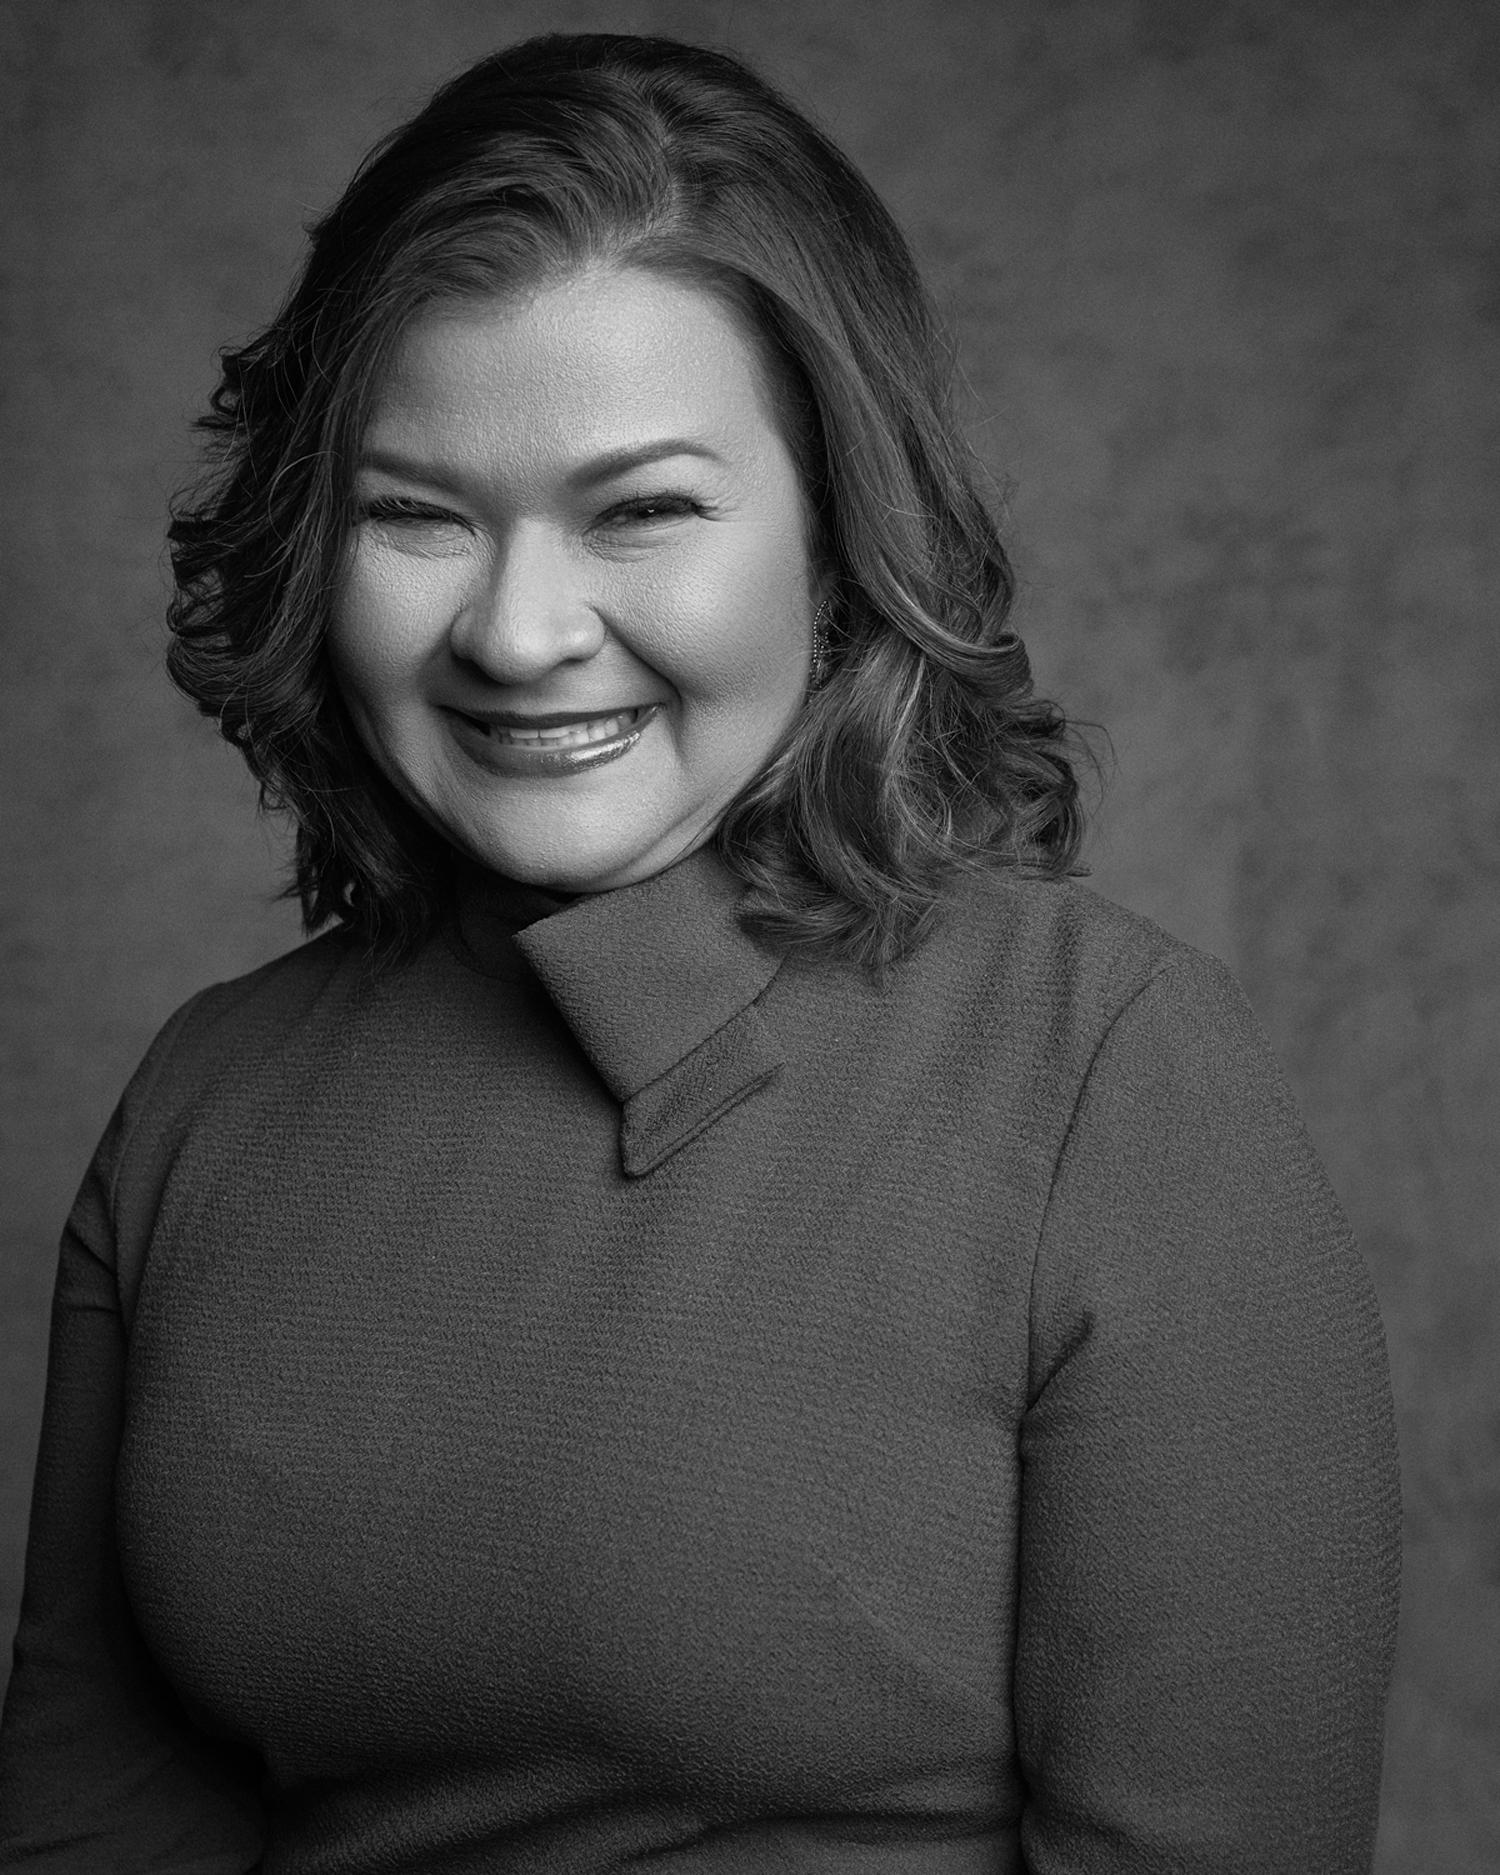 Claudia Mirza, CEO & Co-Founder of Akorbi